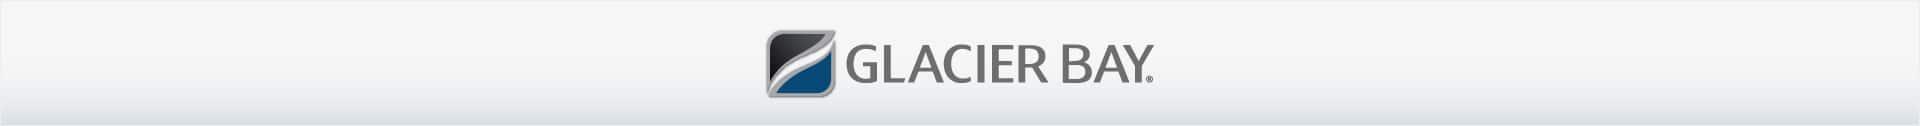 Glacier Bay Brand Banner